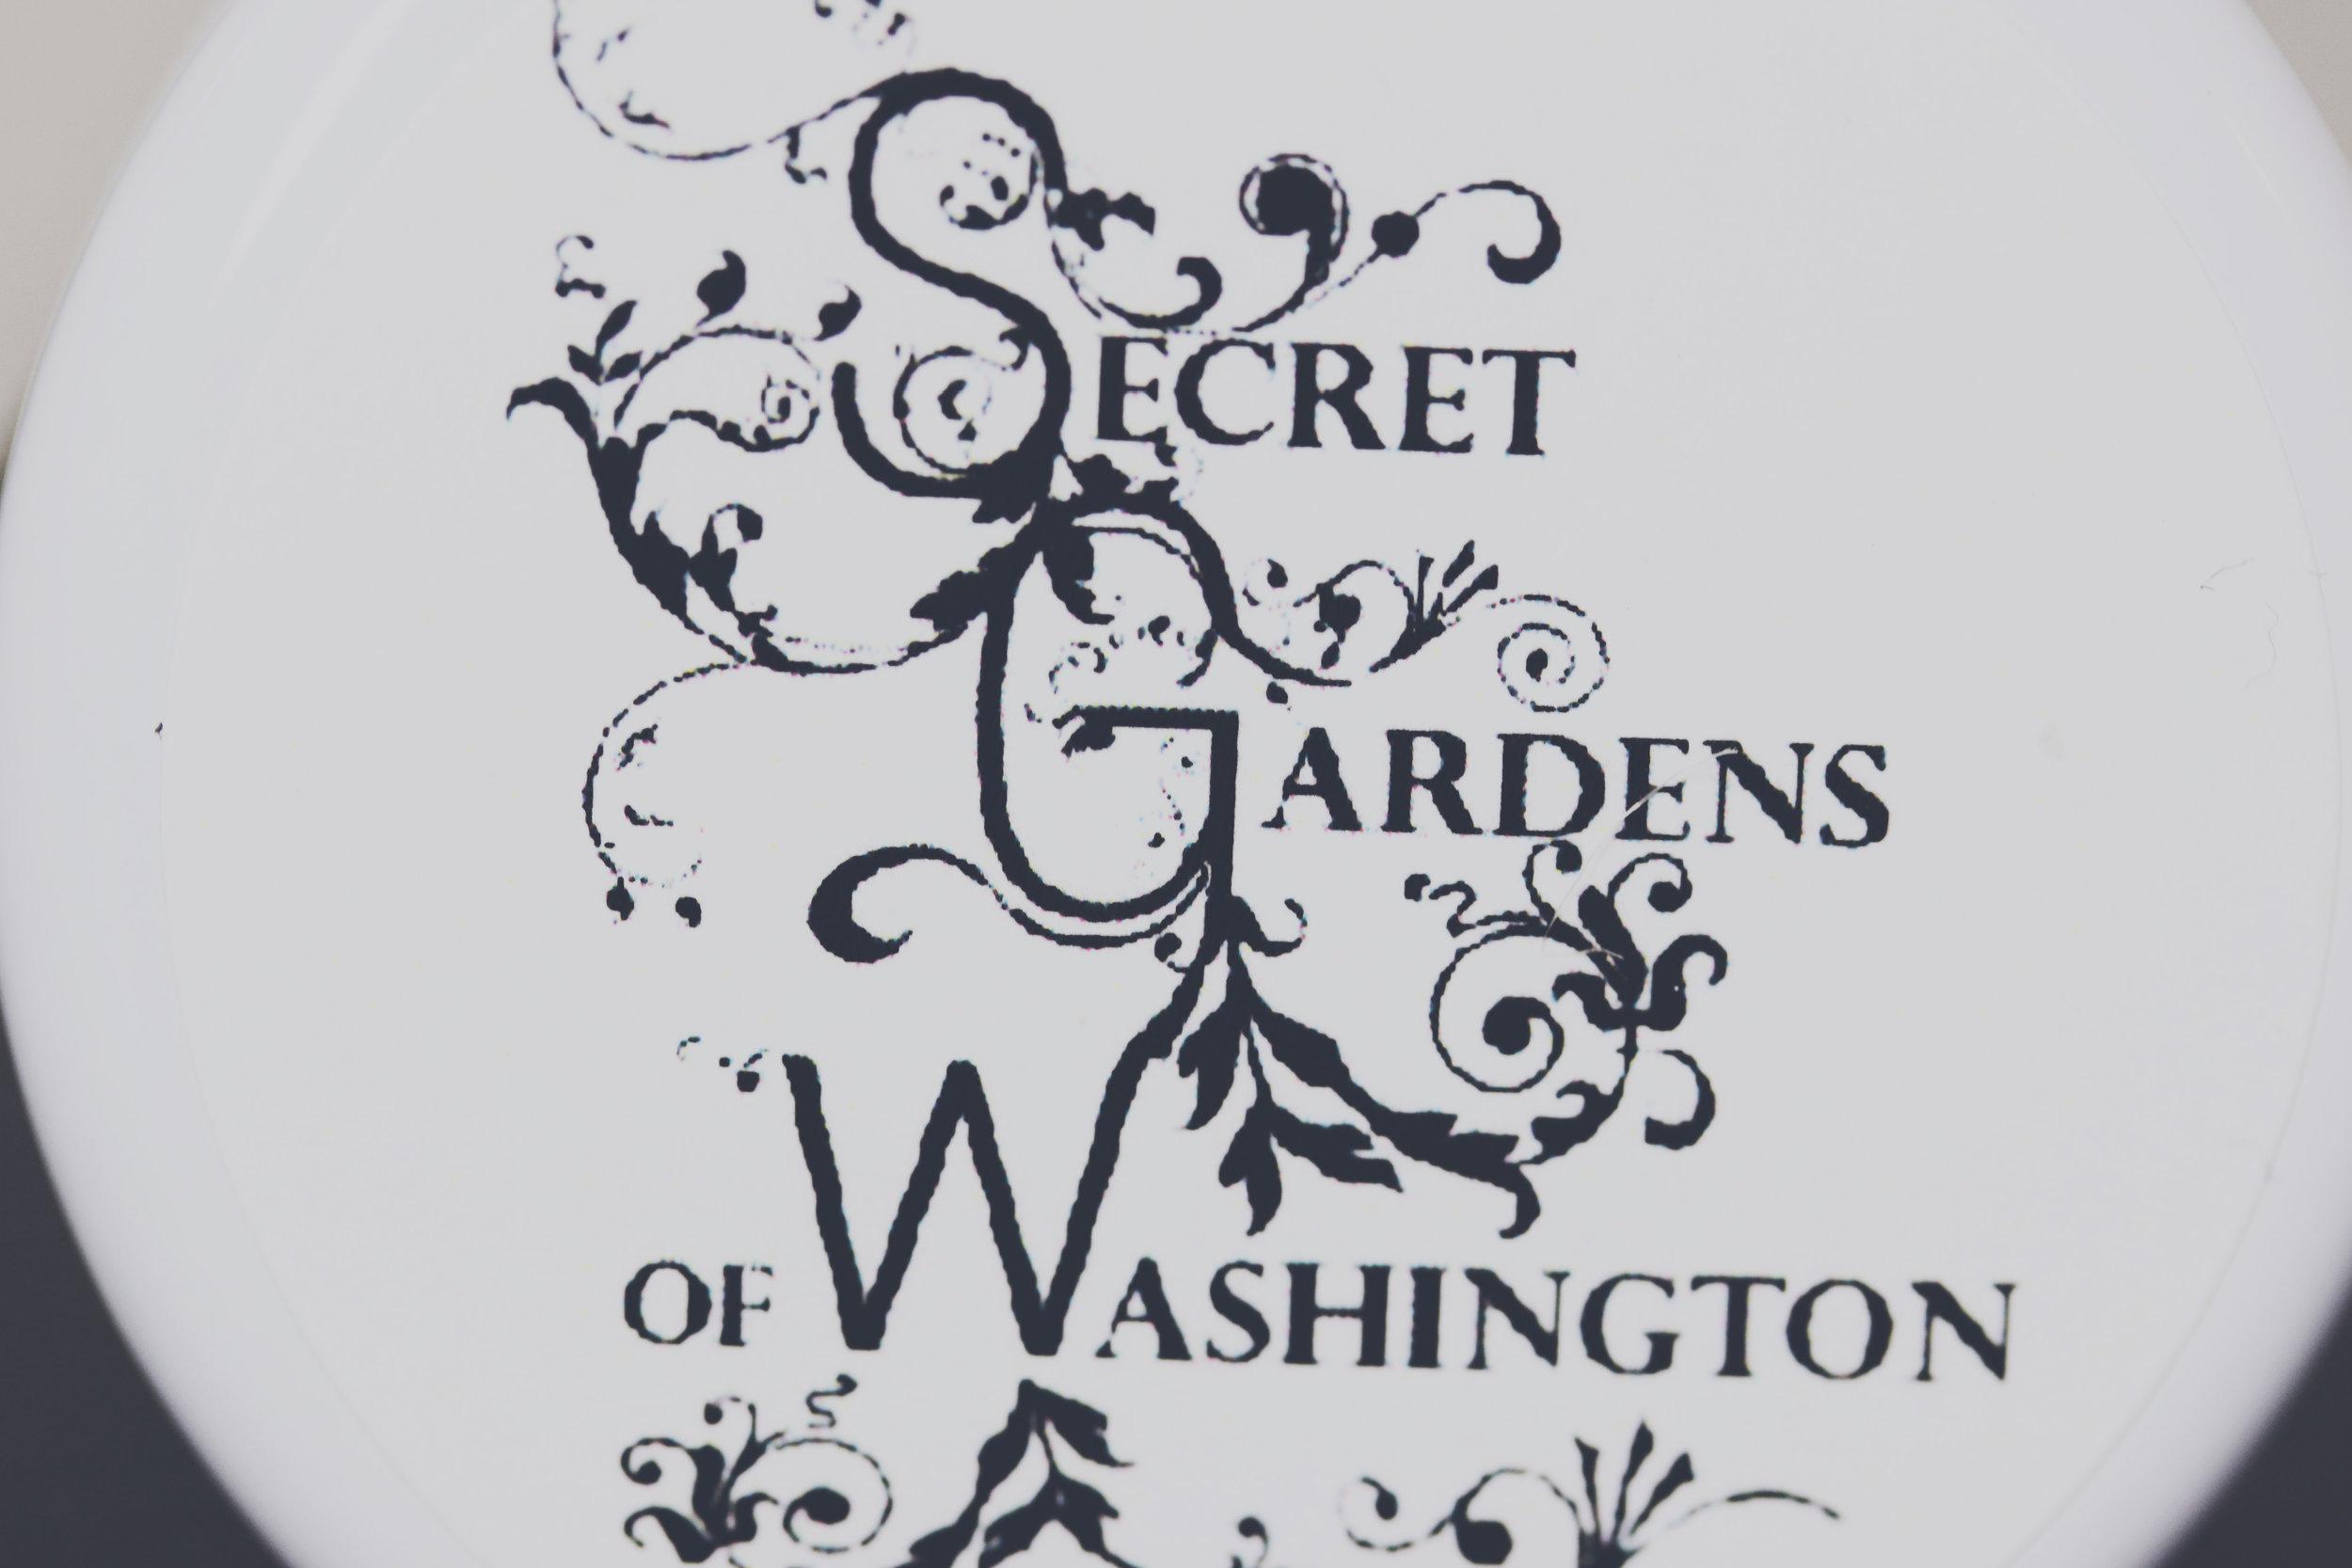 Secret Gardens of Washington - logo.jpg